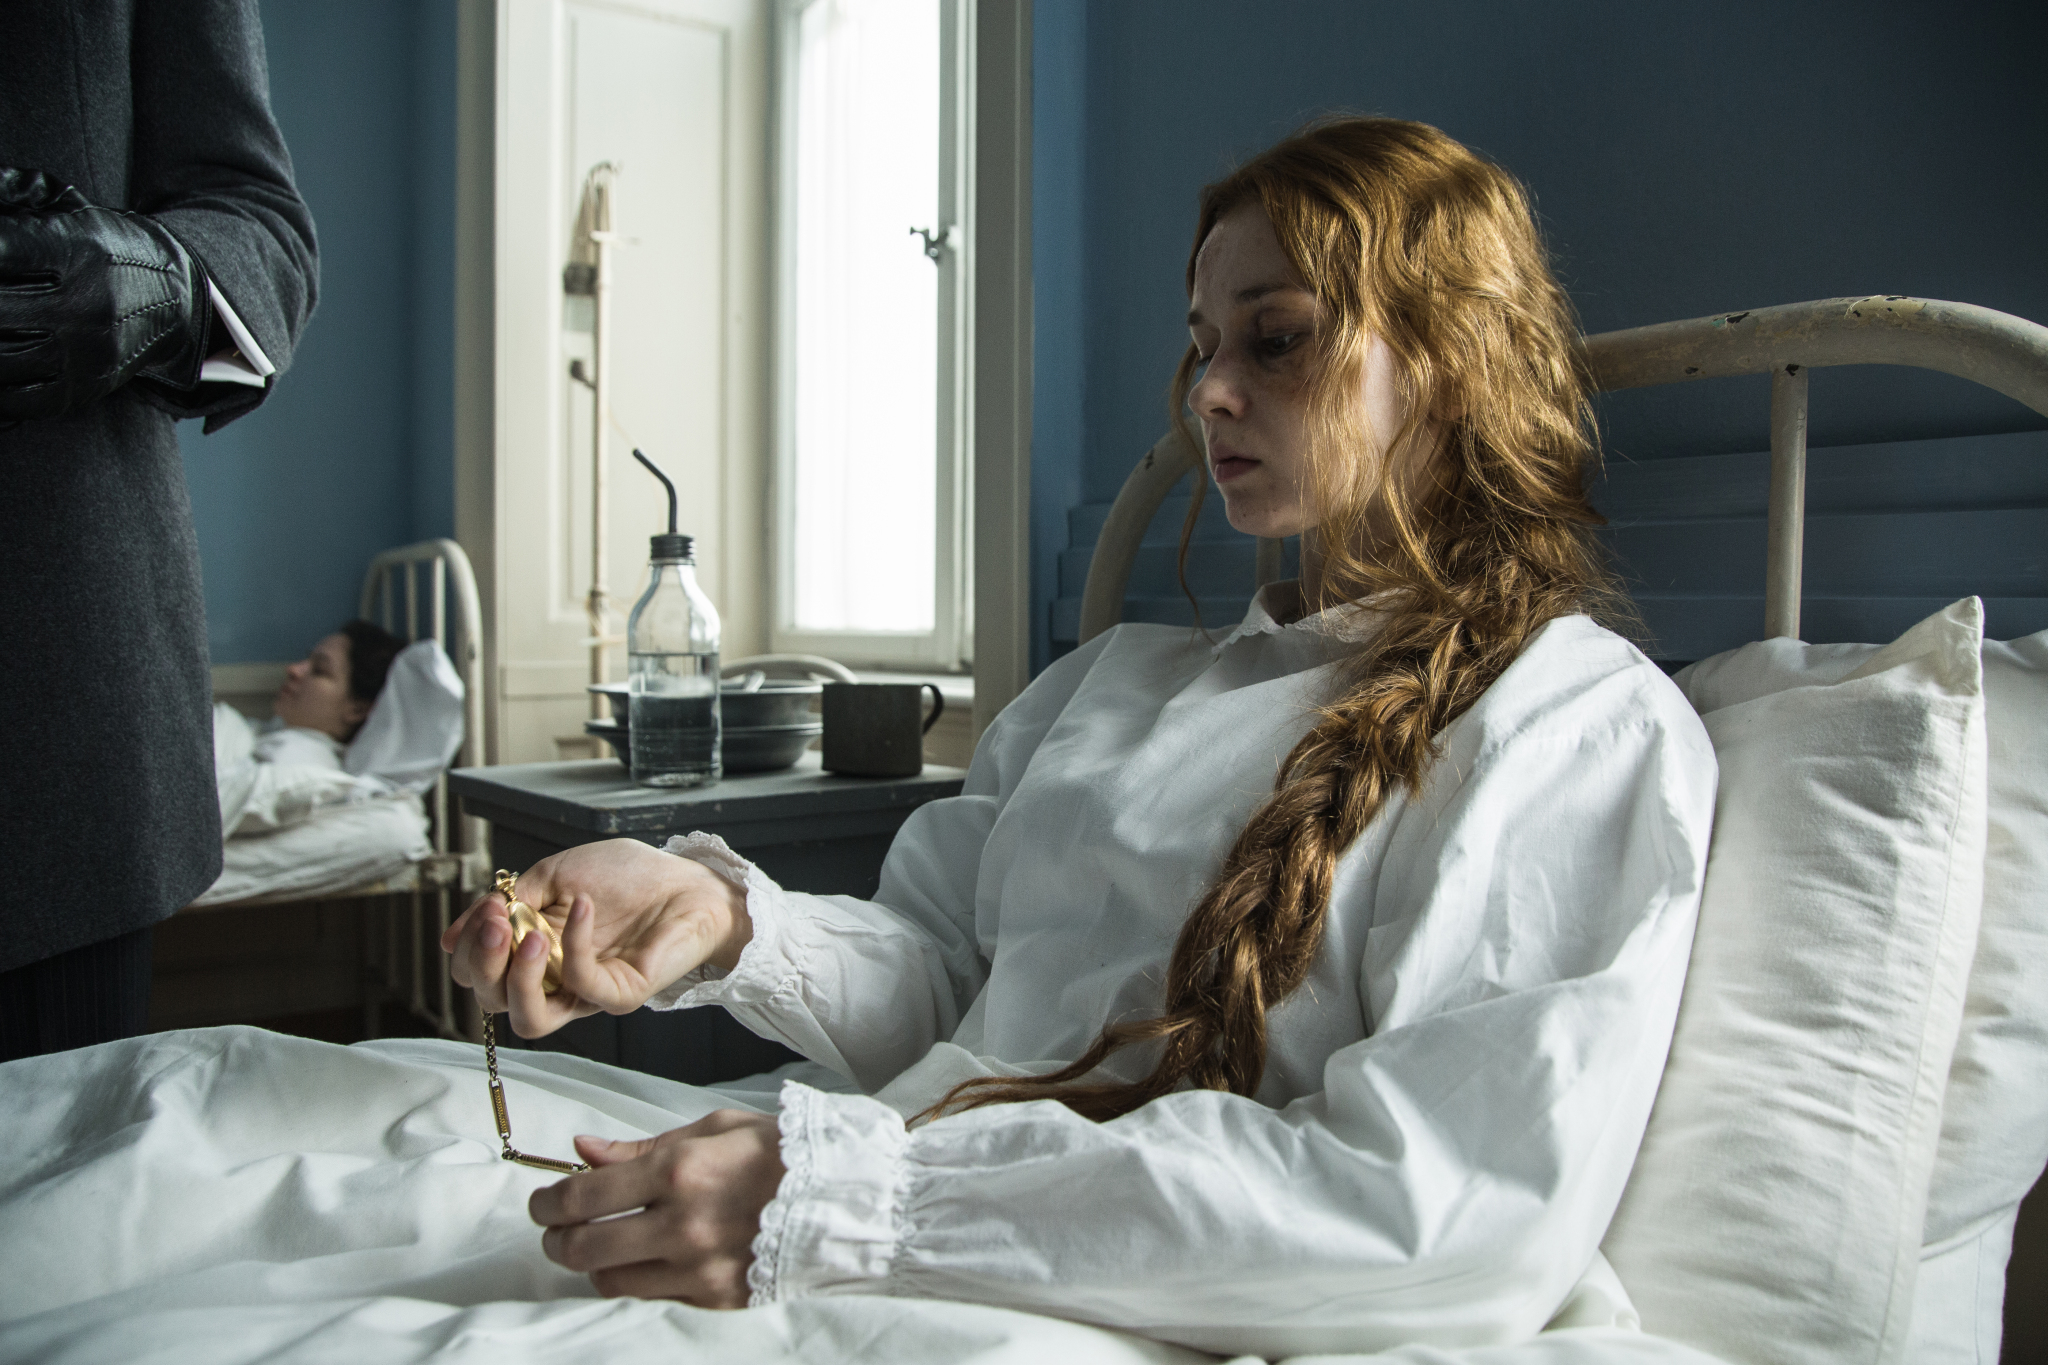 Paulina Szostak - Faustyna Hartman